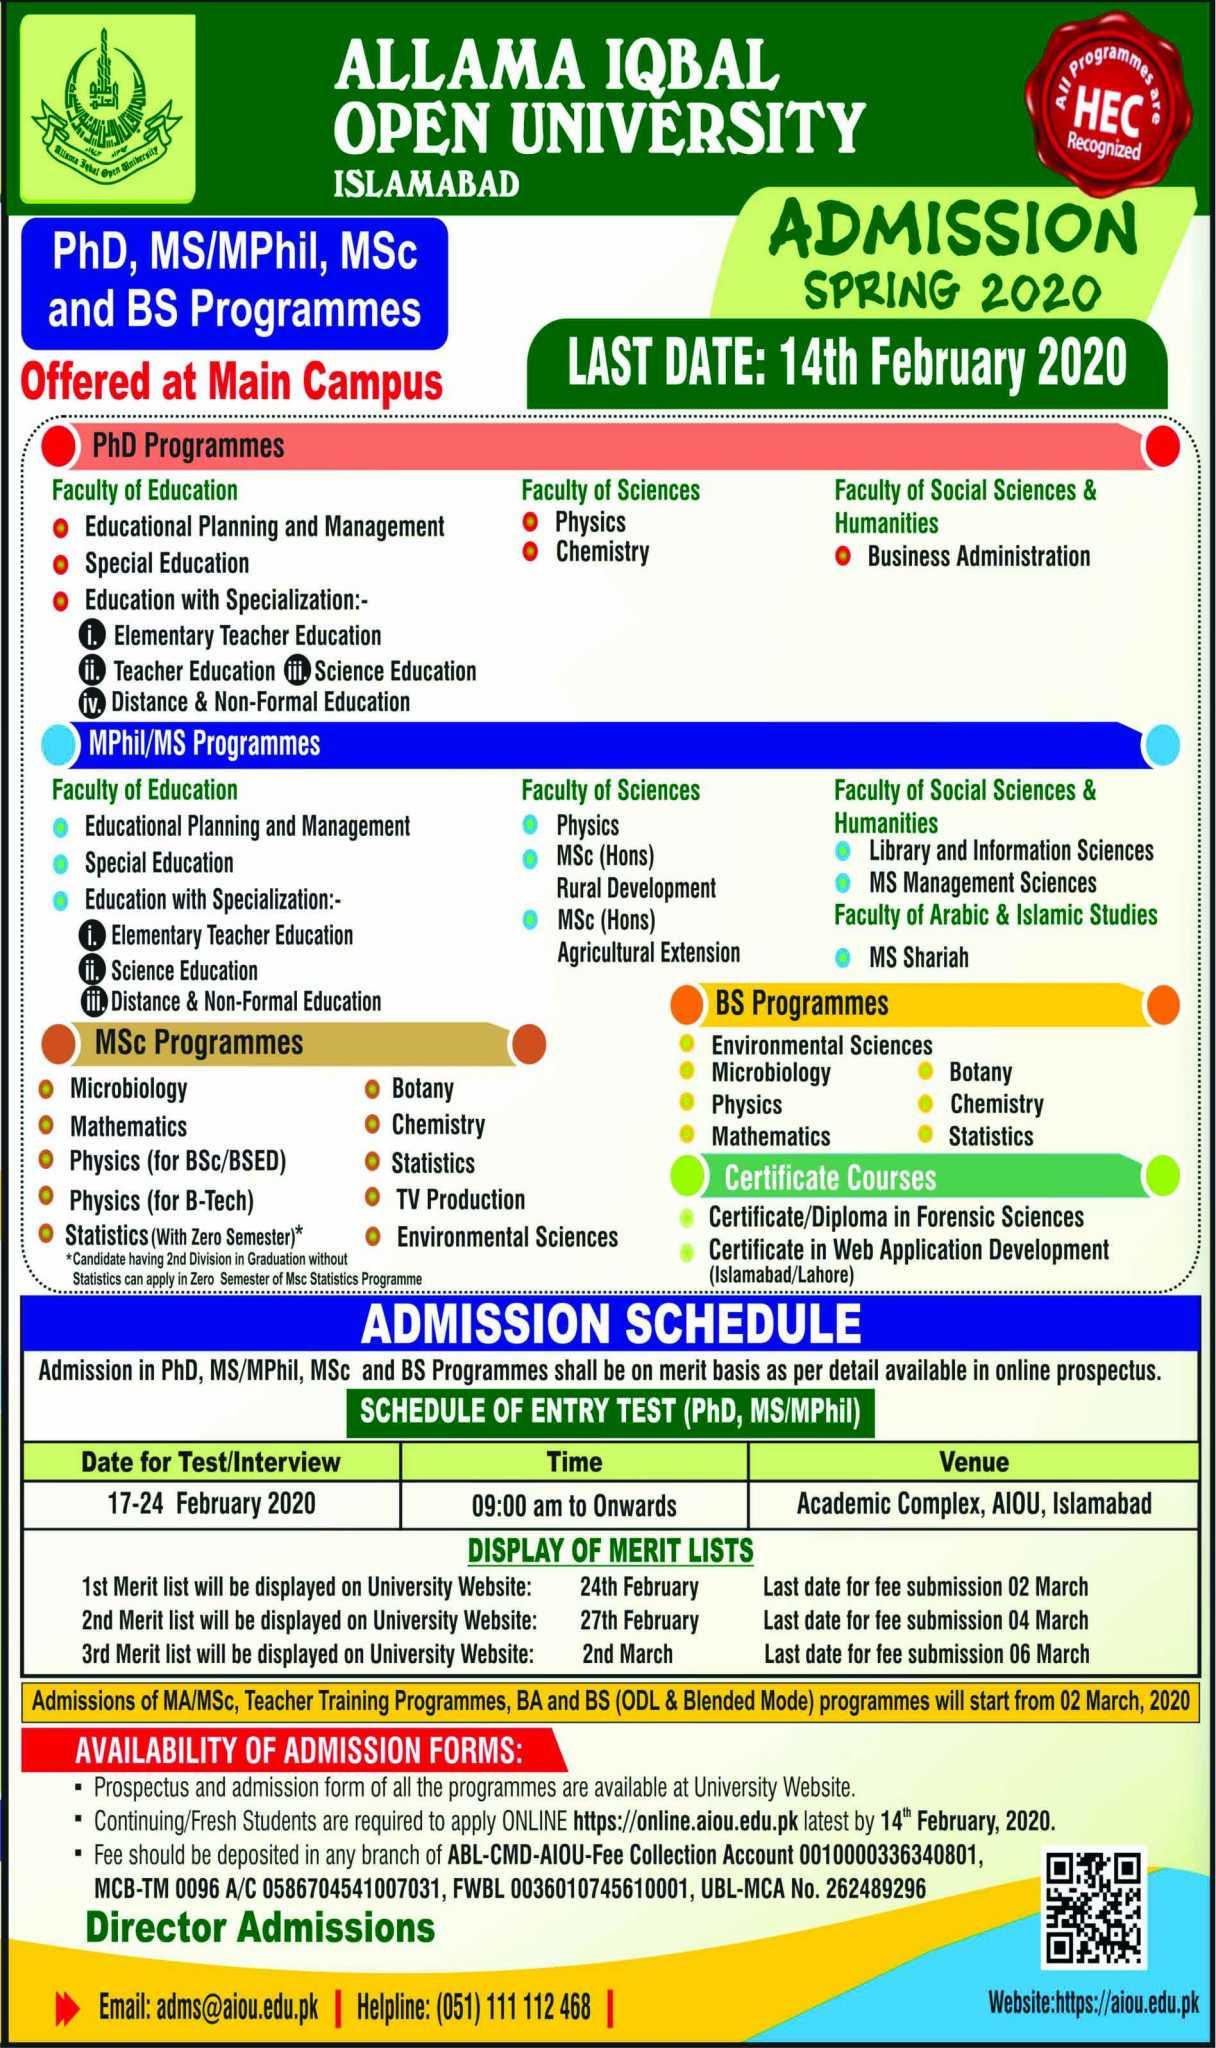 Allama Iqbal Open University AIOU Spring Admission 2020